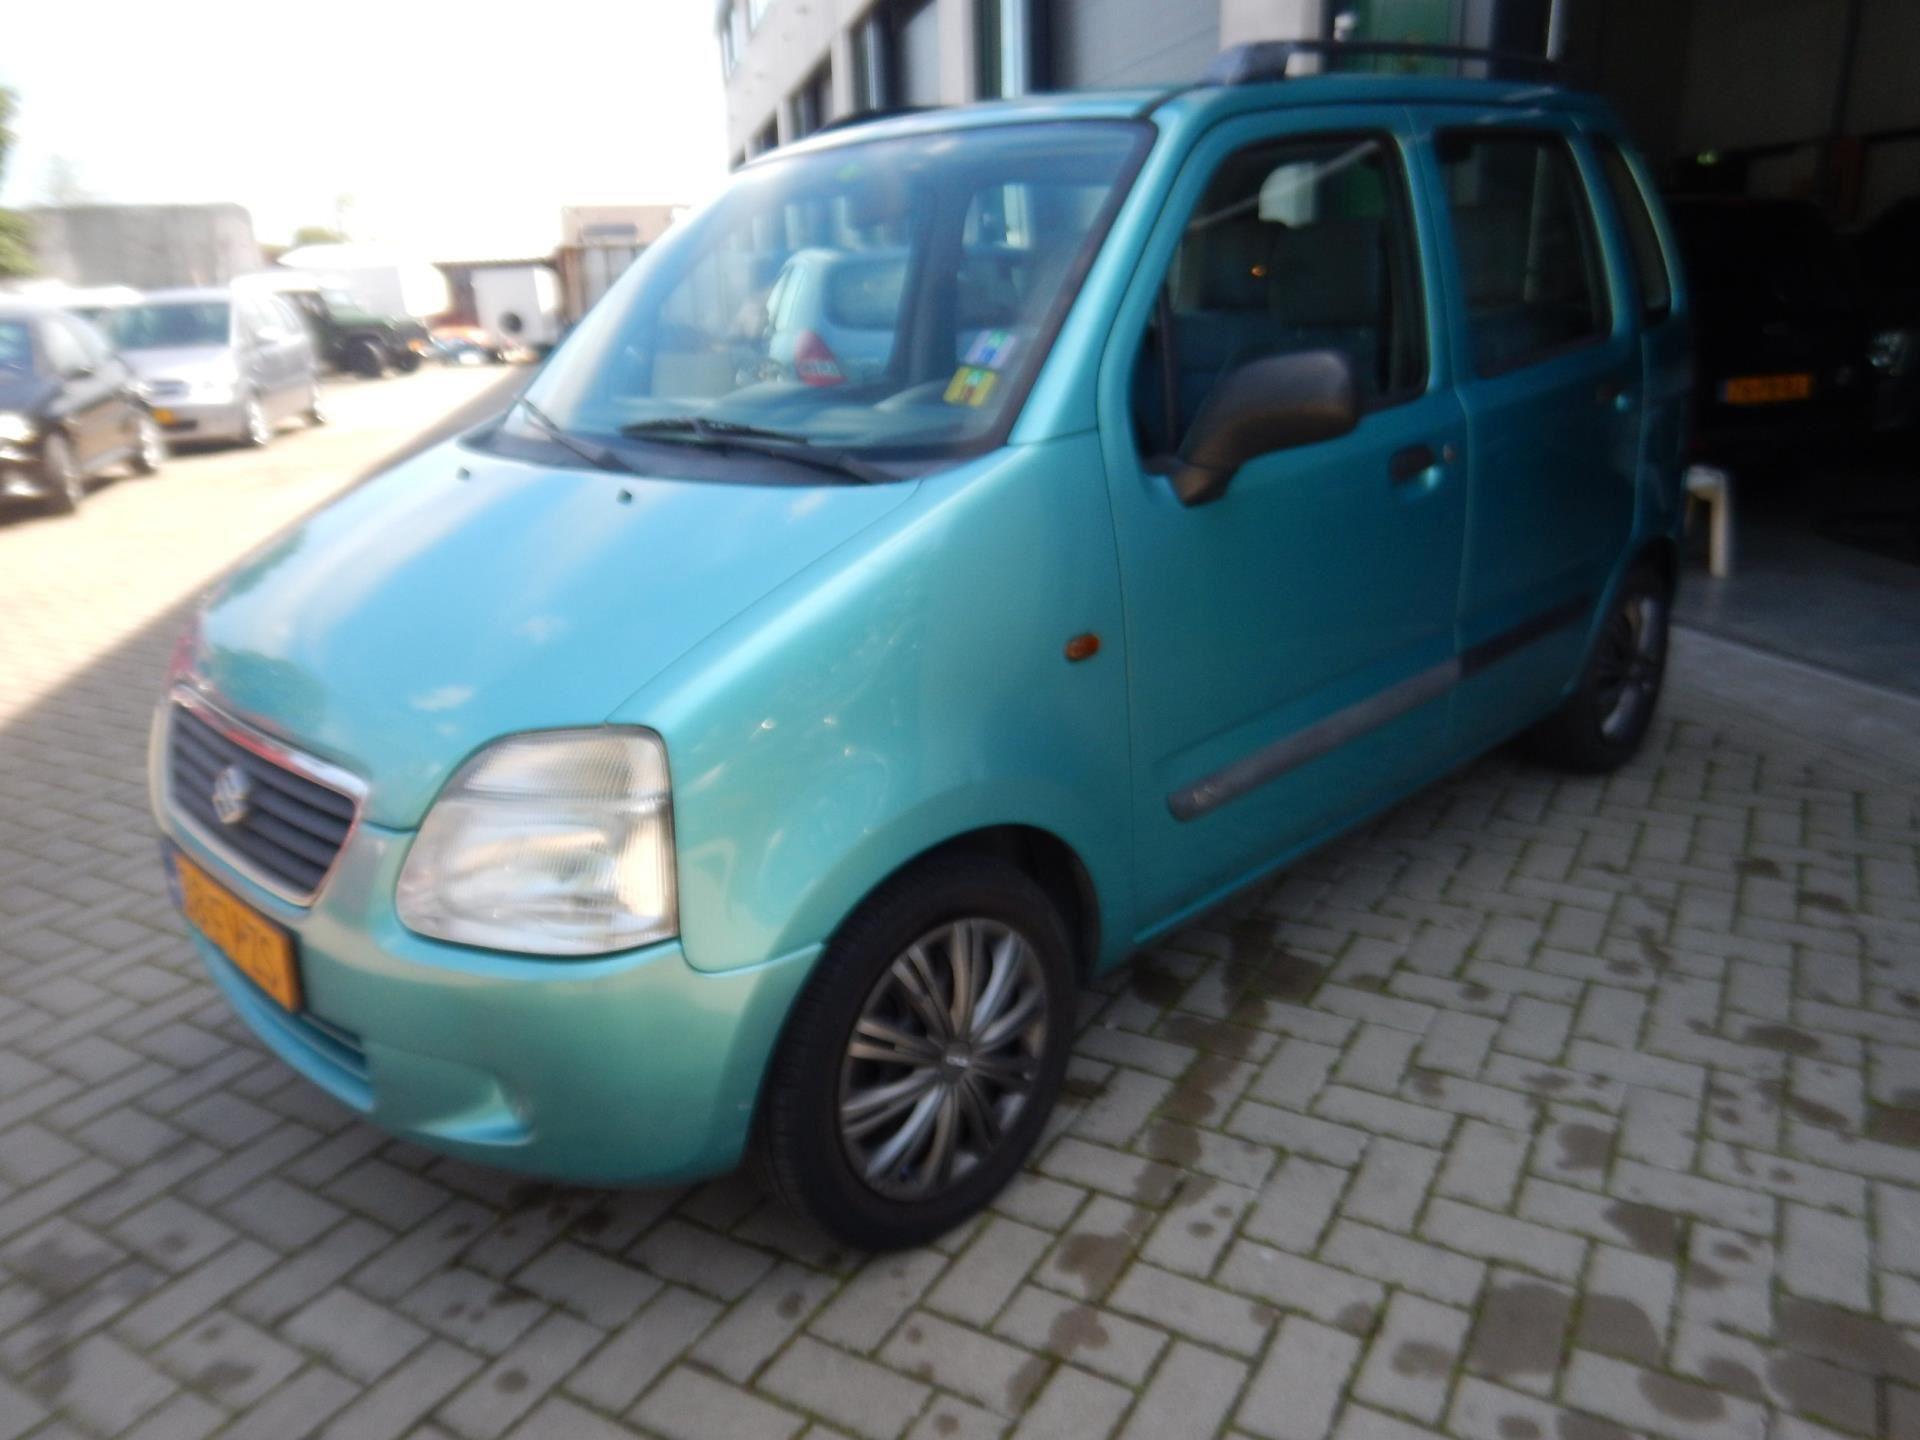 Suzuki Wagon R occasion - Pitstop 4 You